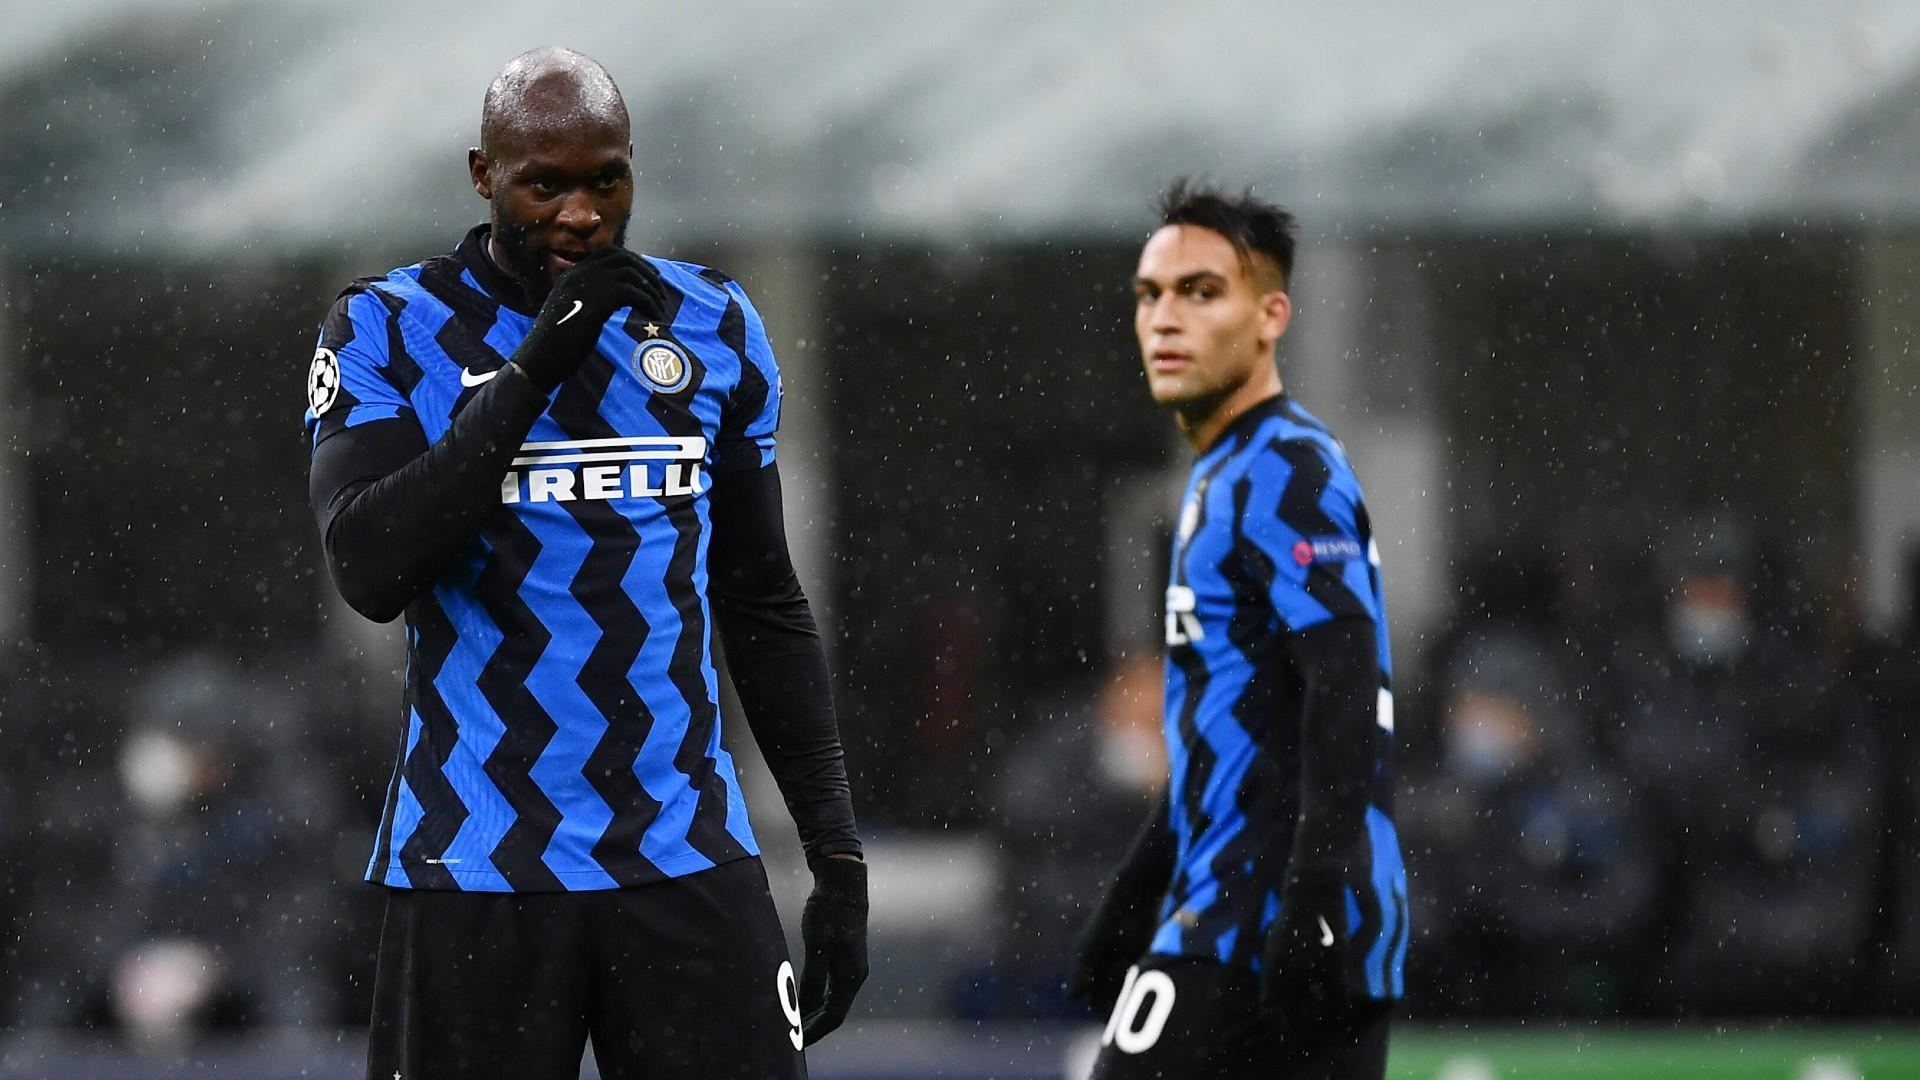 Inter Mailand Vs SSC Neapel Live Im TV Und Livestream